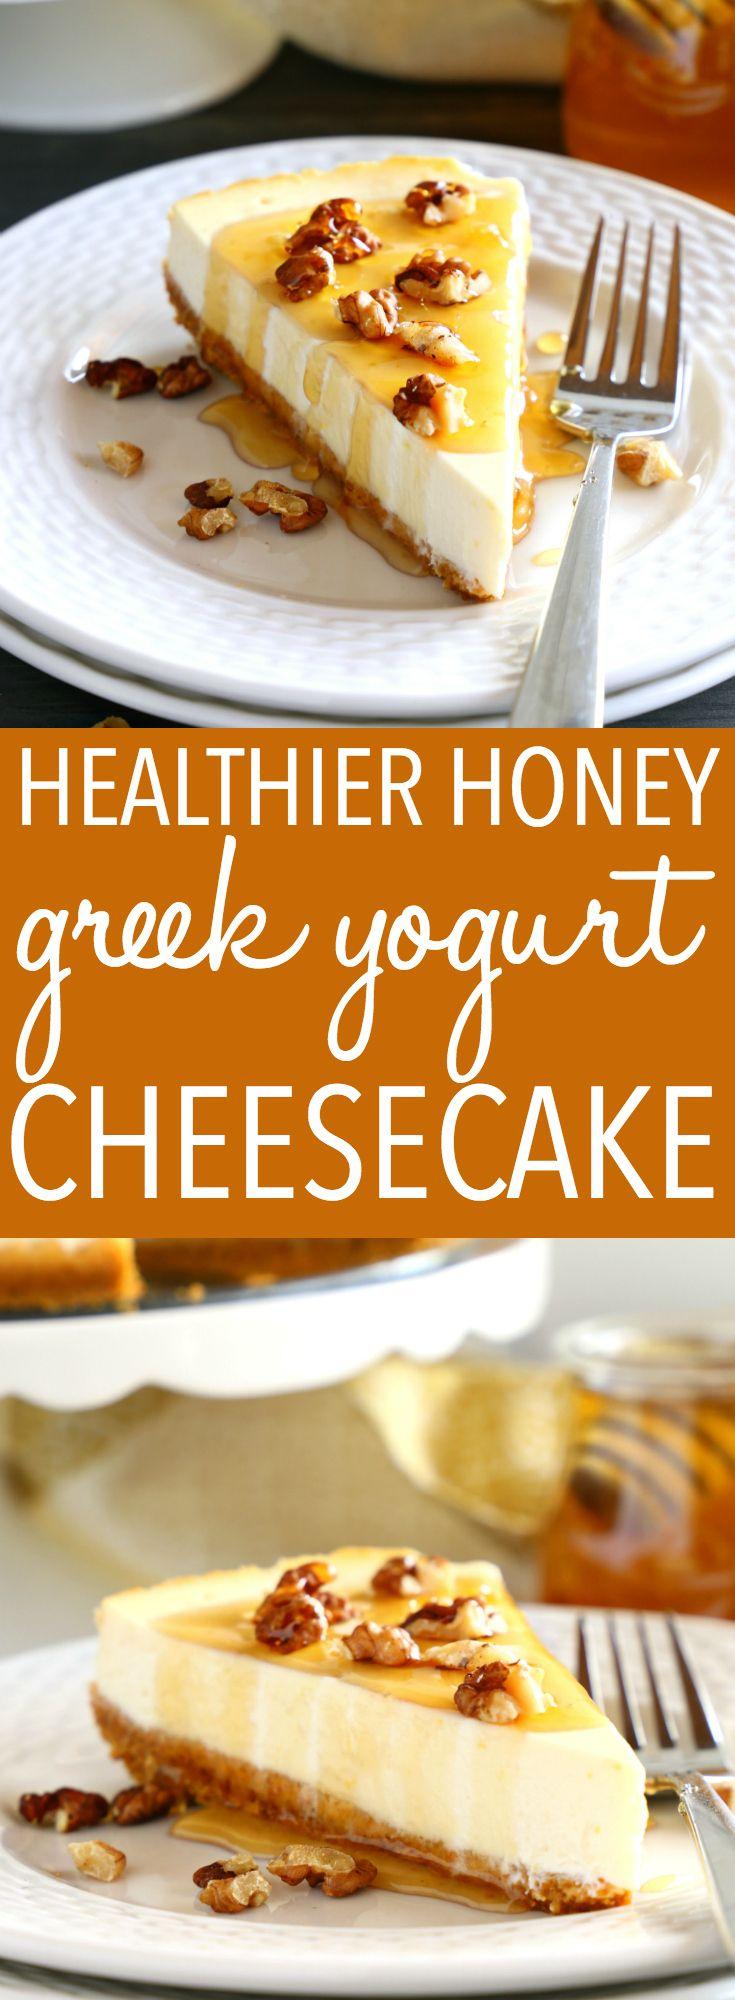 This Healthy Honey Greek Yogurt Cheesecake is the BEST healthy dessert for summe…